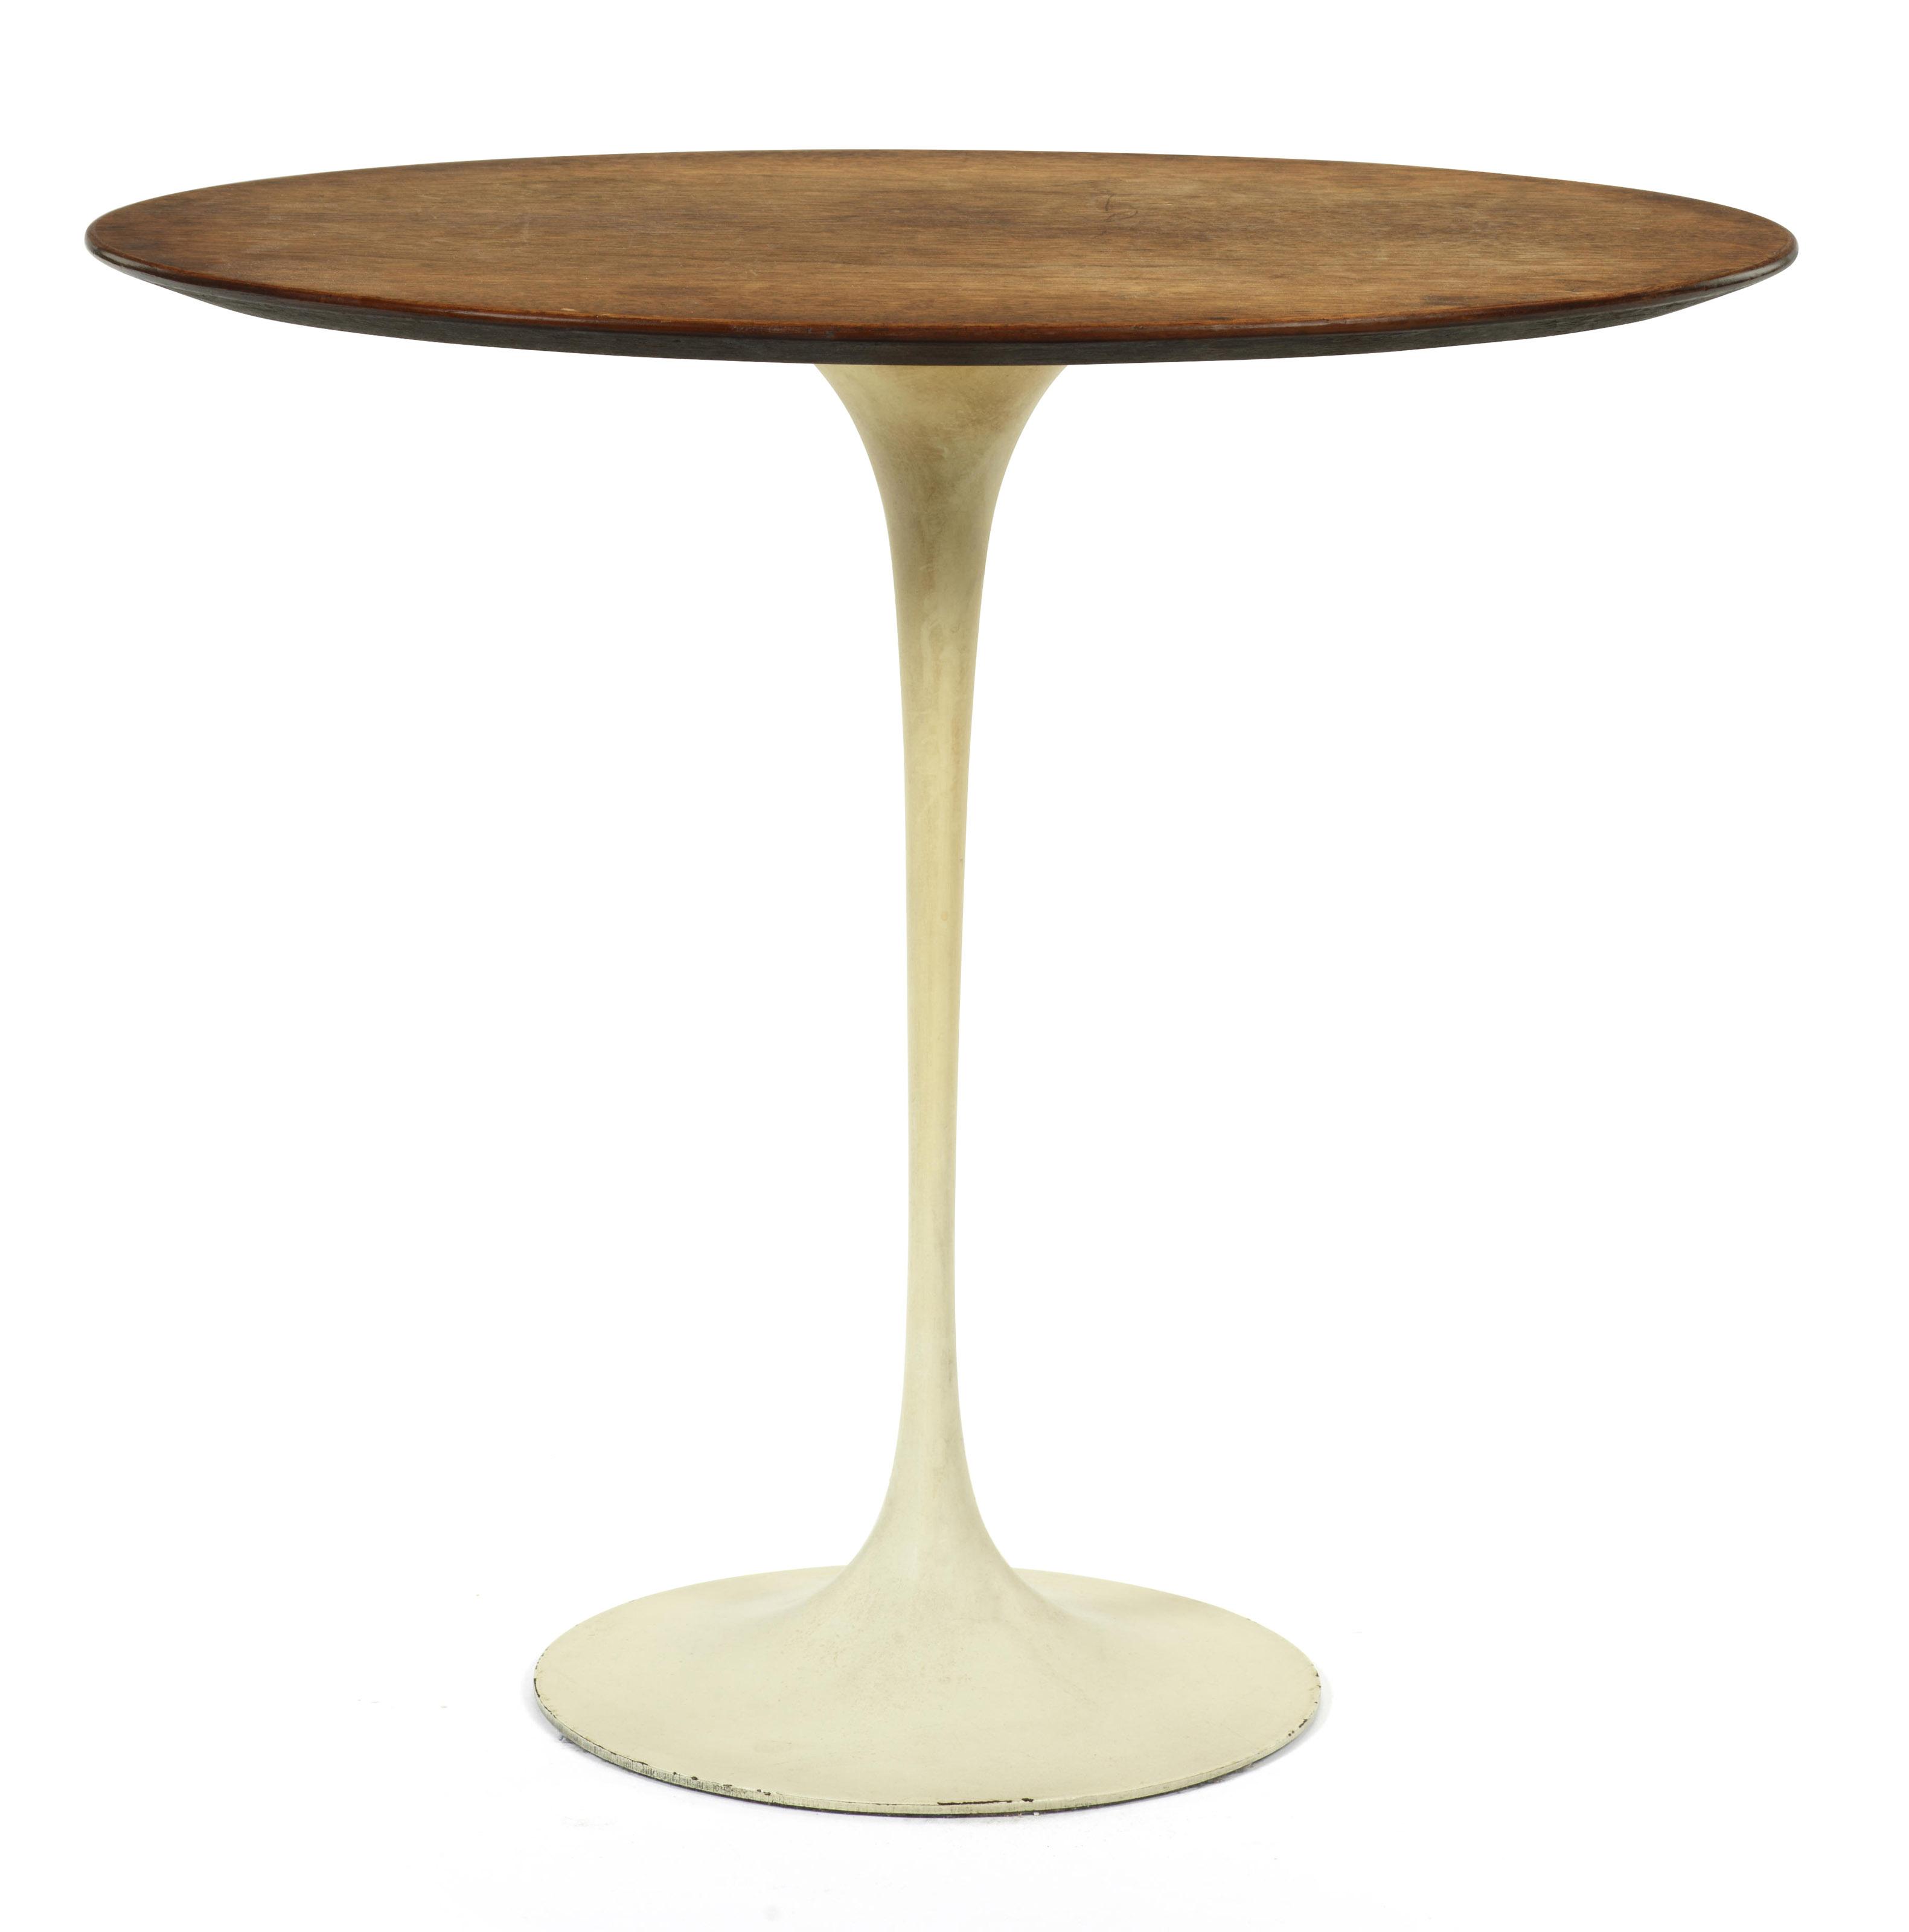 EERO SAARINEN TULIP OR PEDESTAL TABLE FOR KNOLL - Knoll pedestal table